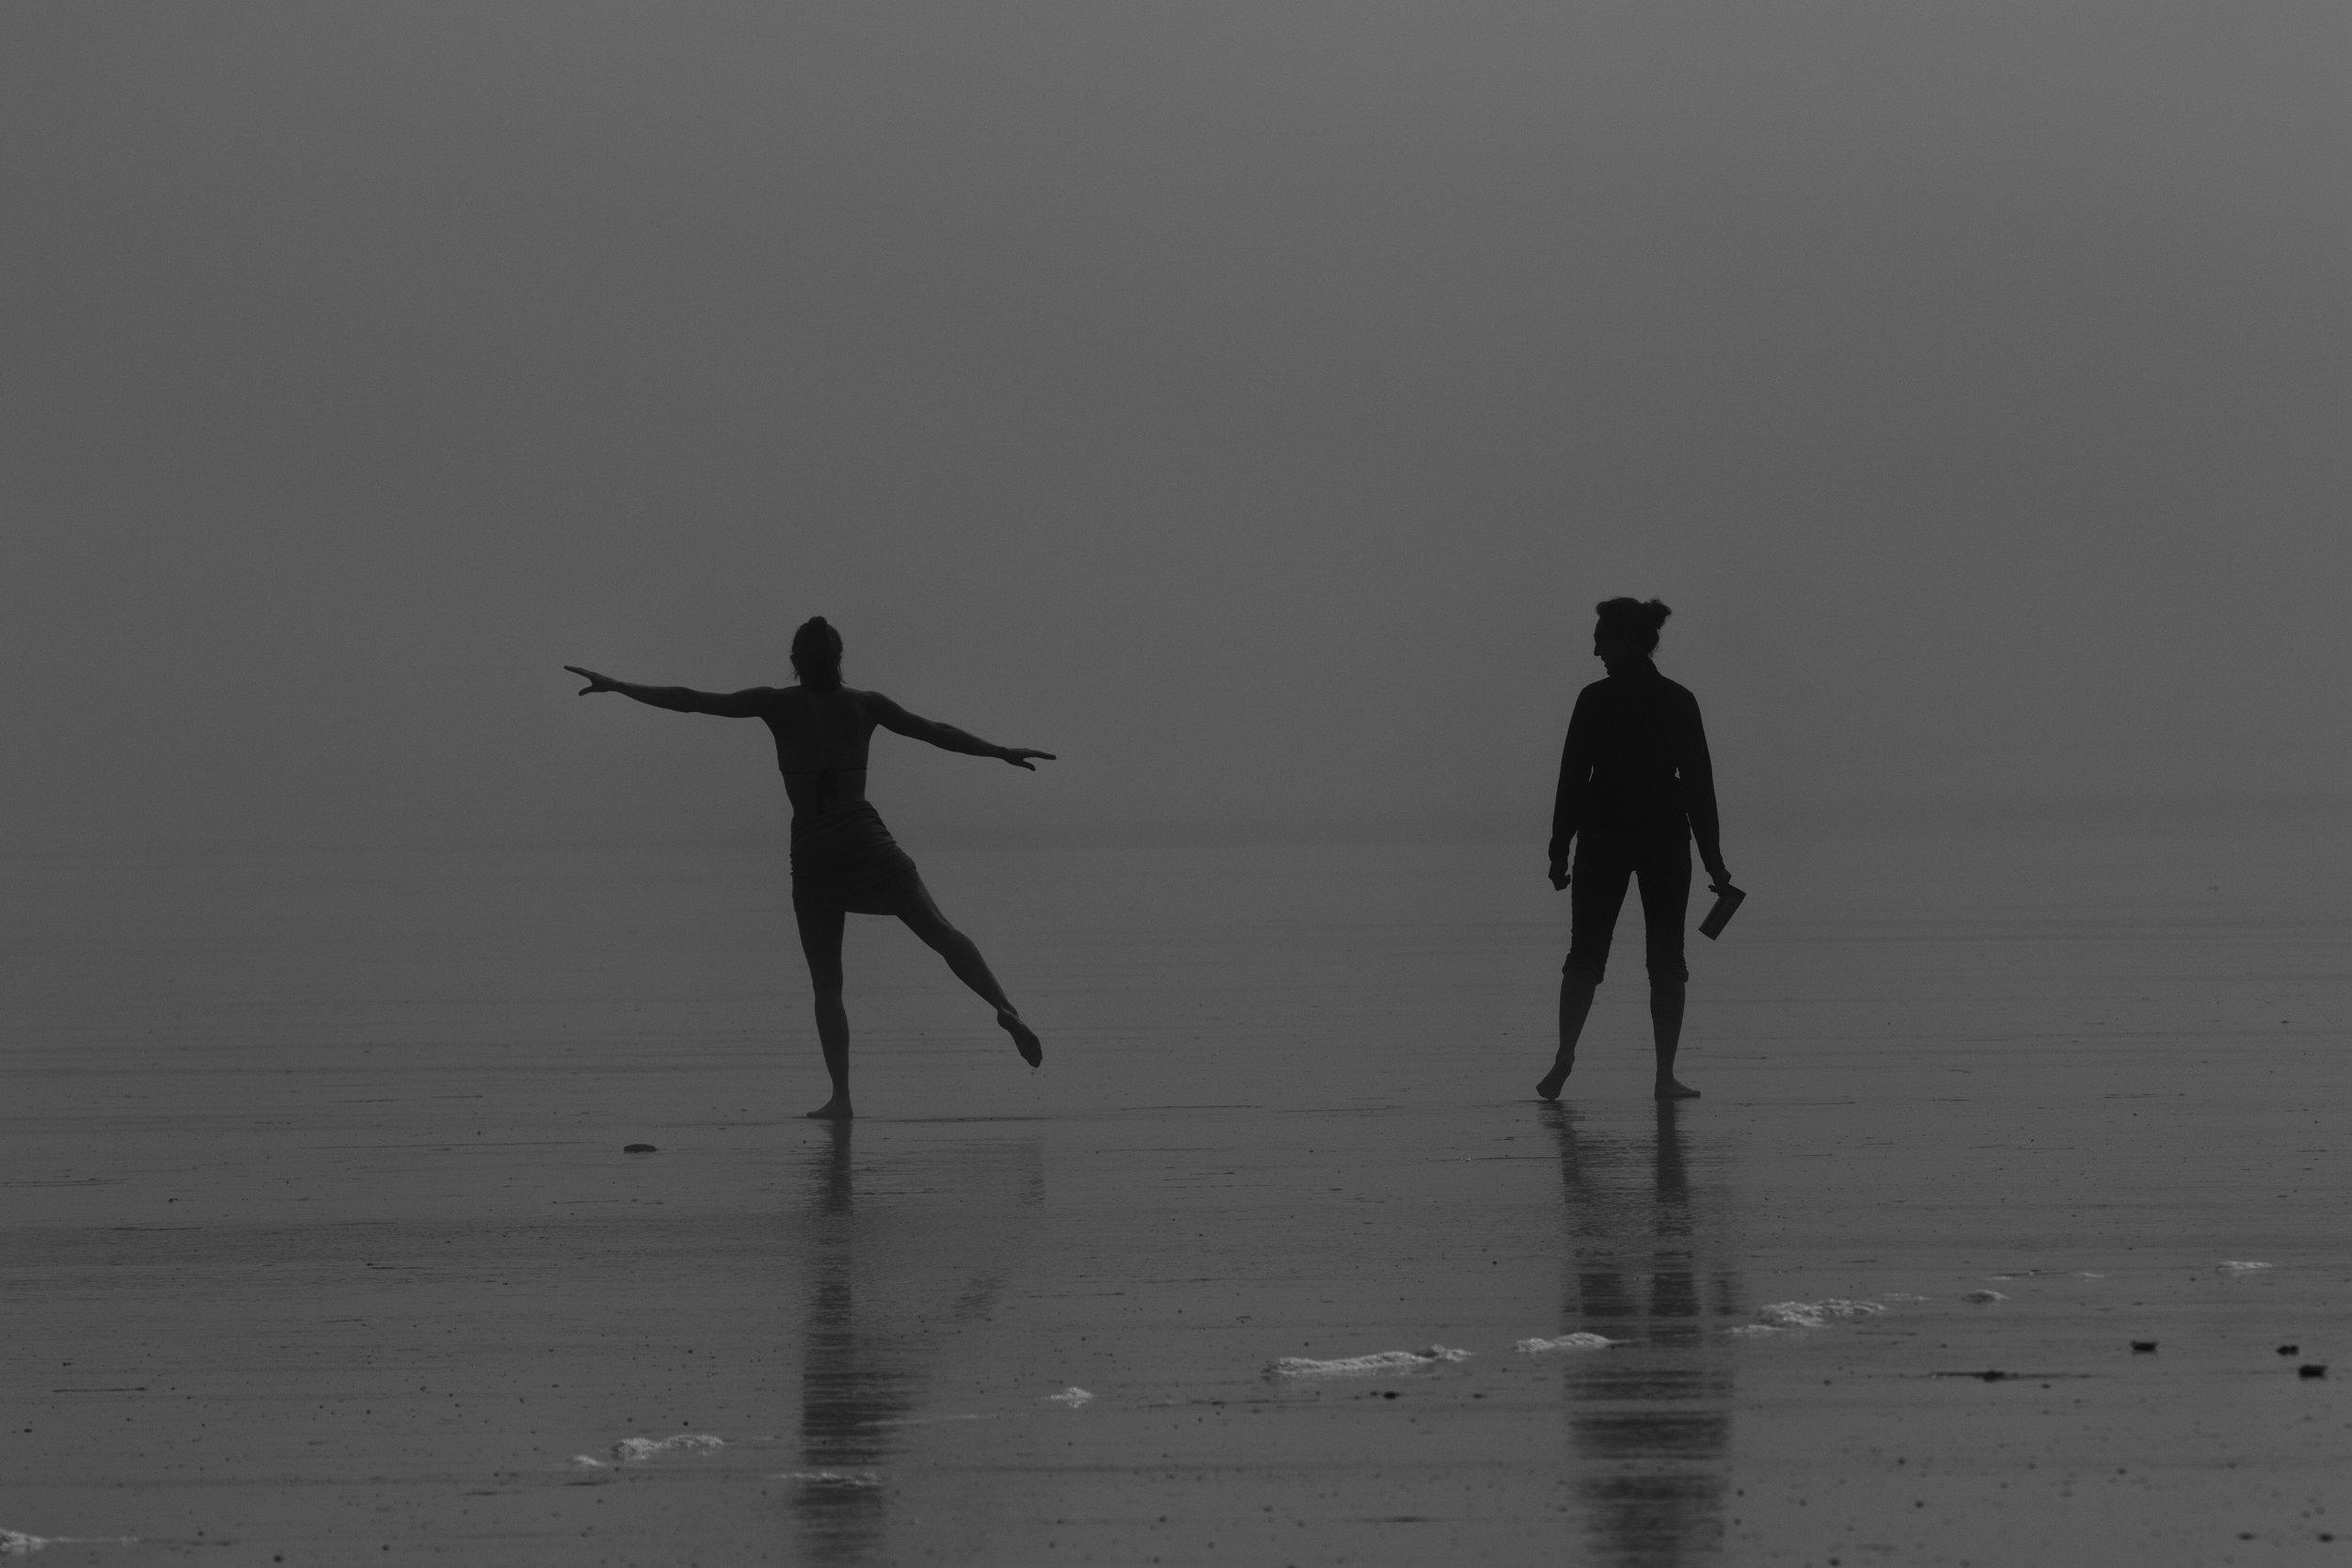 20160721-2016-07-21 at 09-28-34 Beach, Dancer, Silhouette, Mist, Fog, Friends.jpg